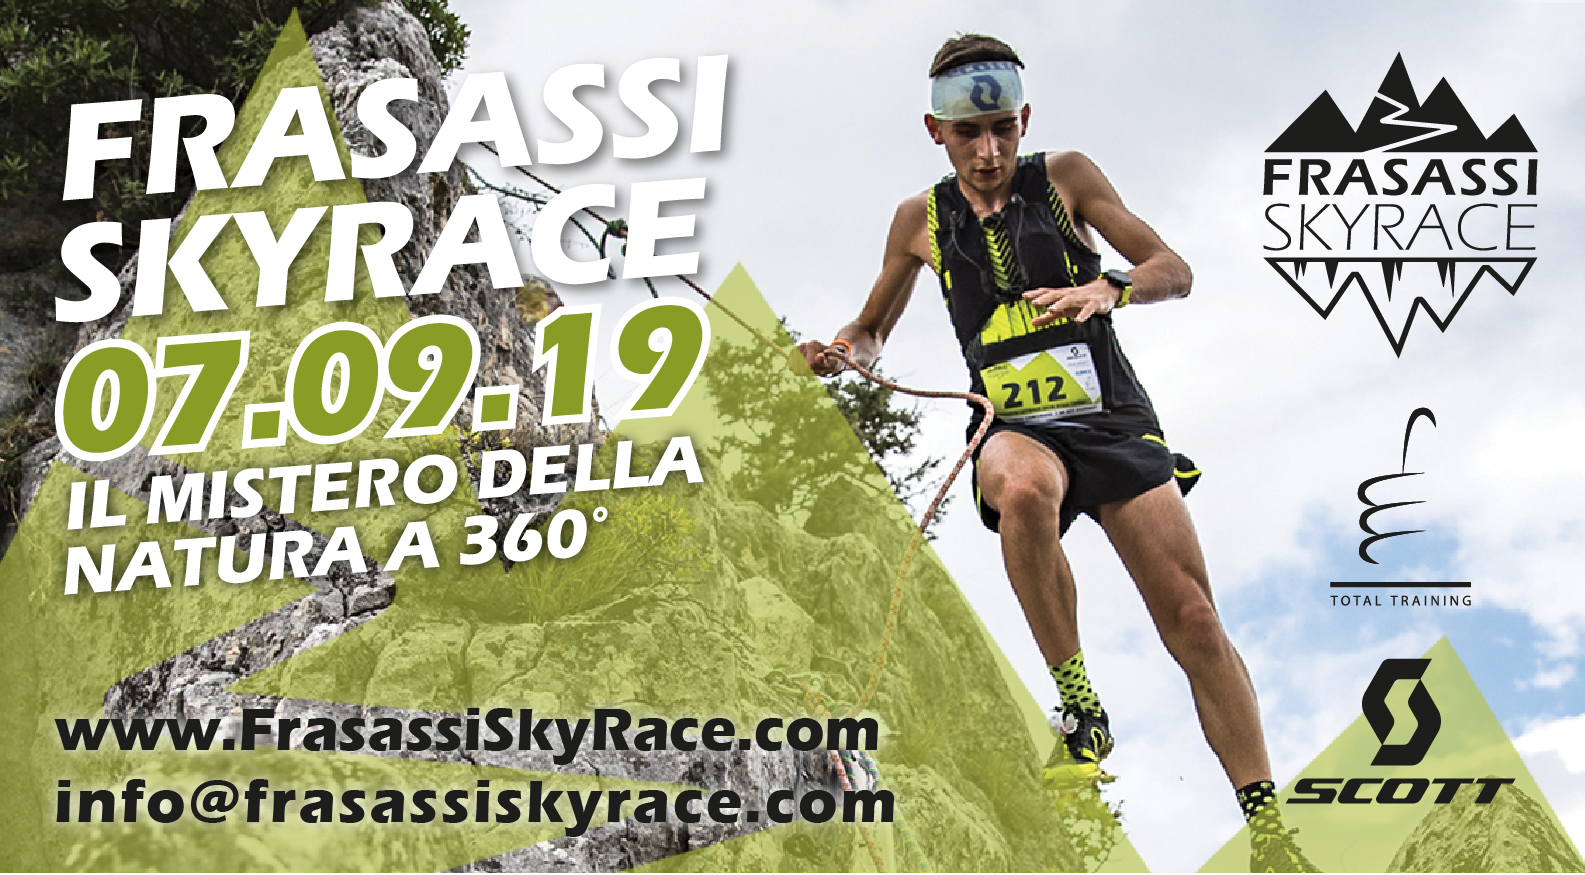 Frasassi SkyRace 2019